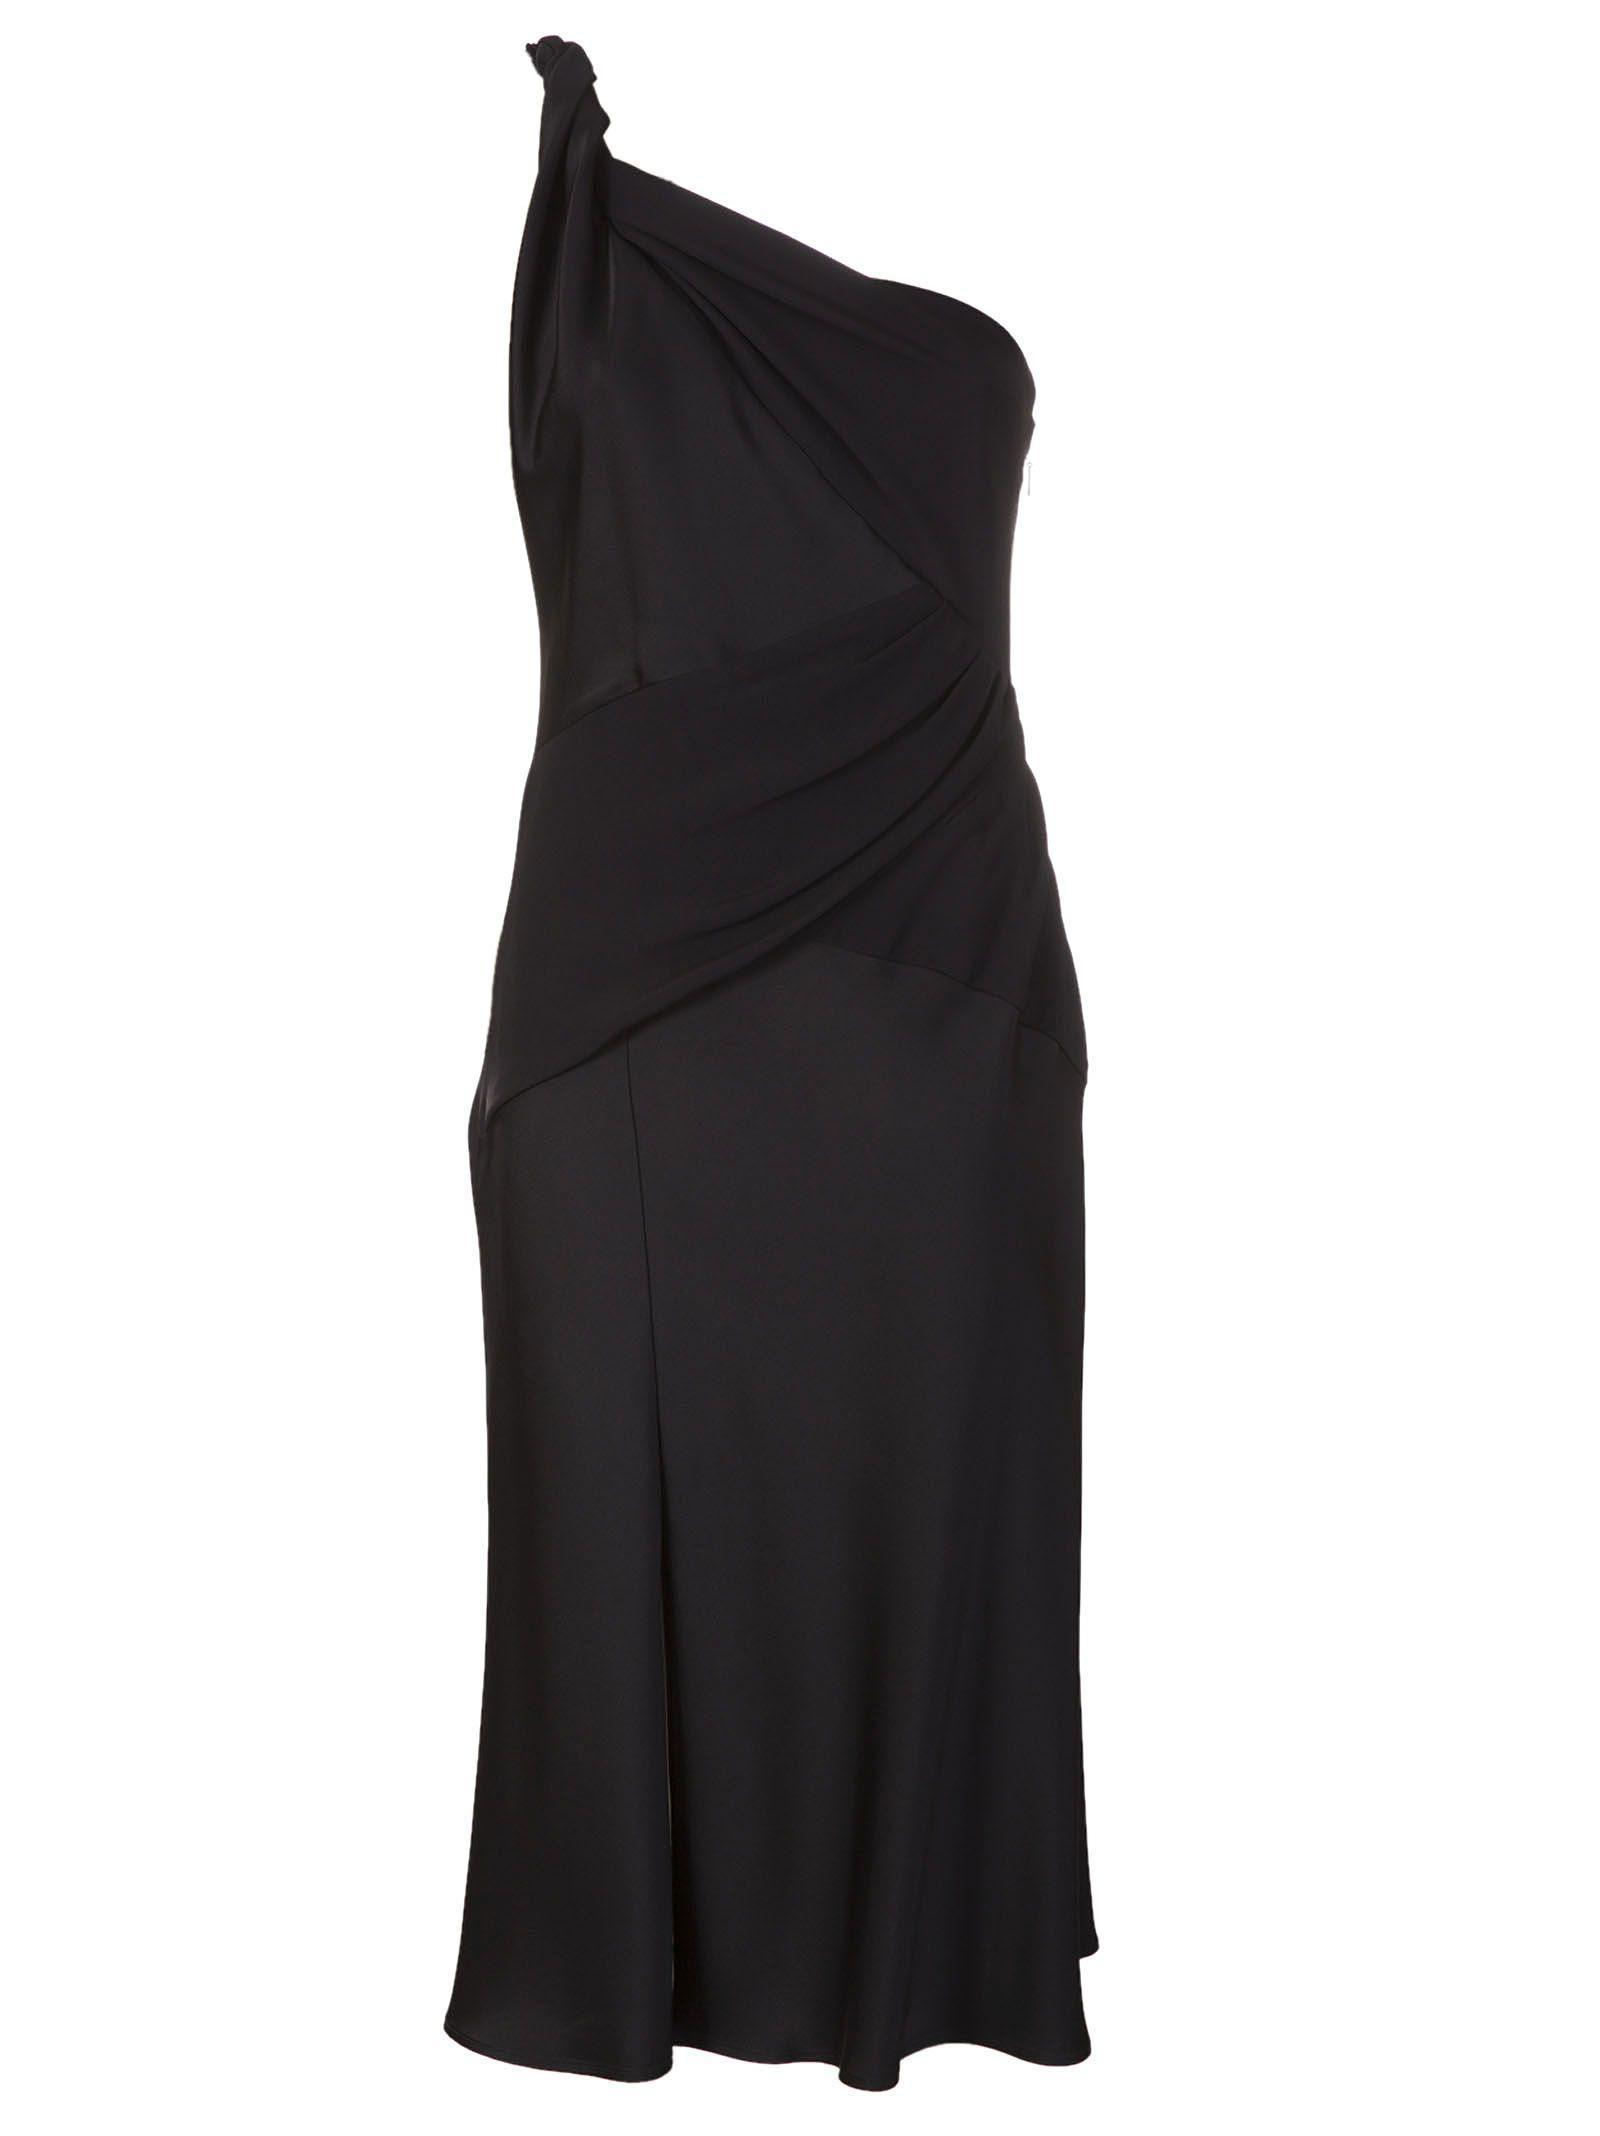 Versace Twisted One Shoulder Dress